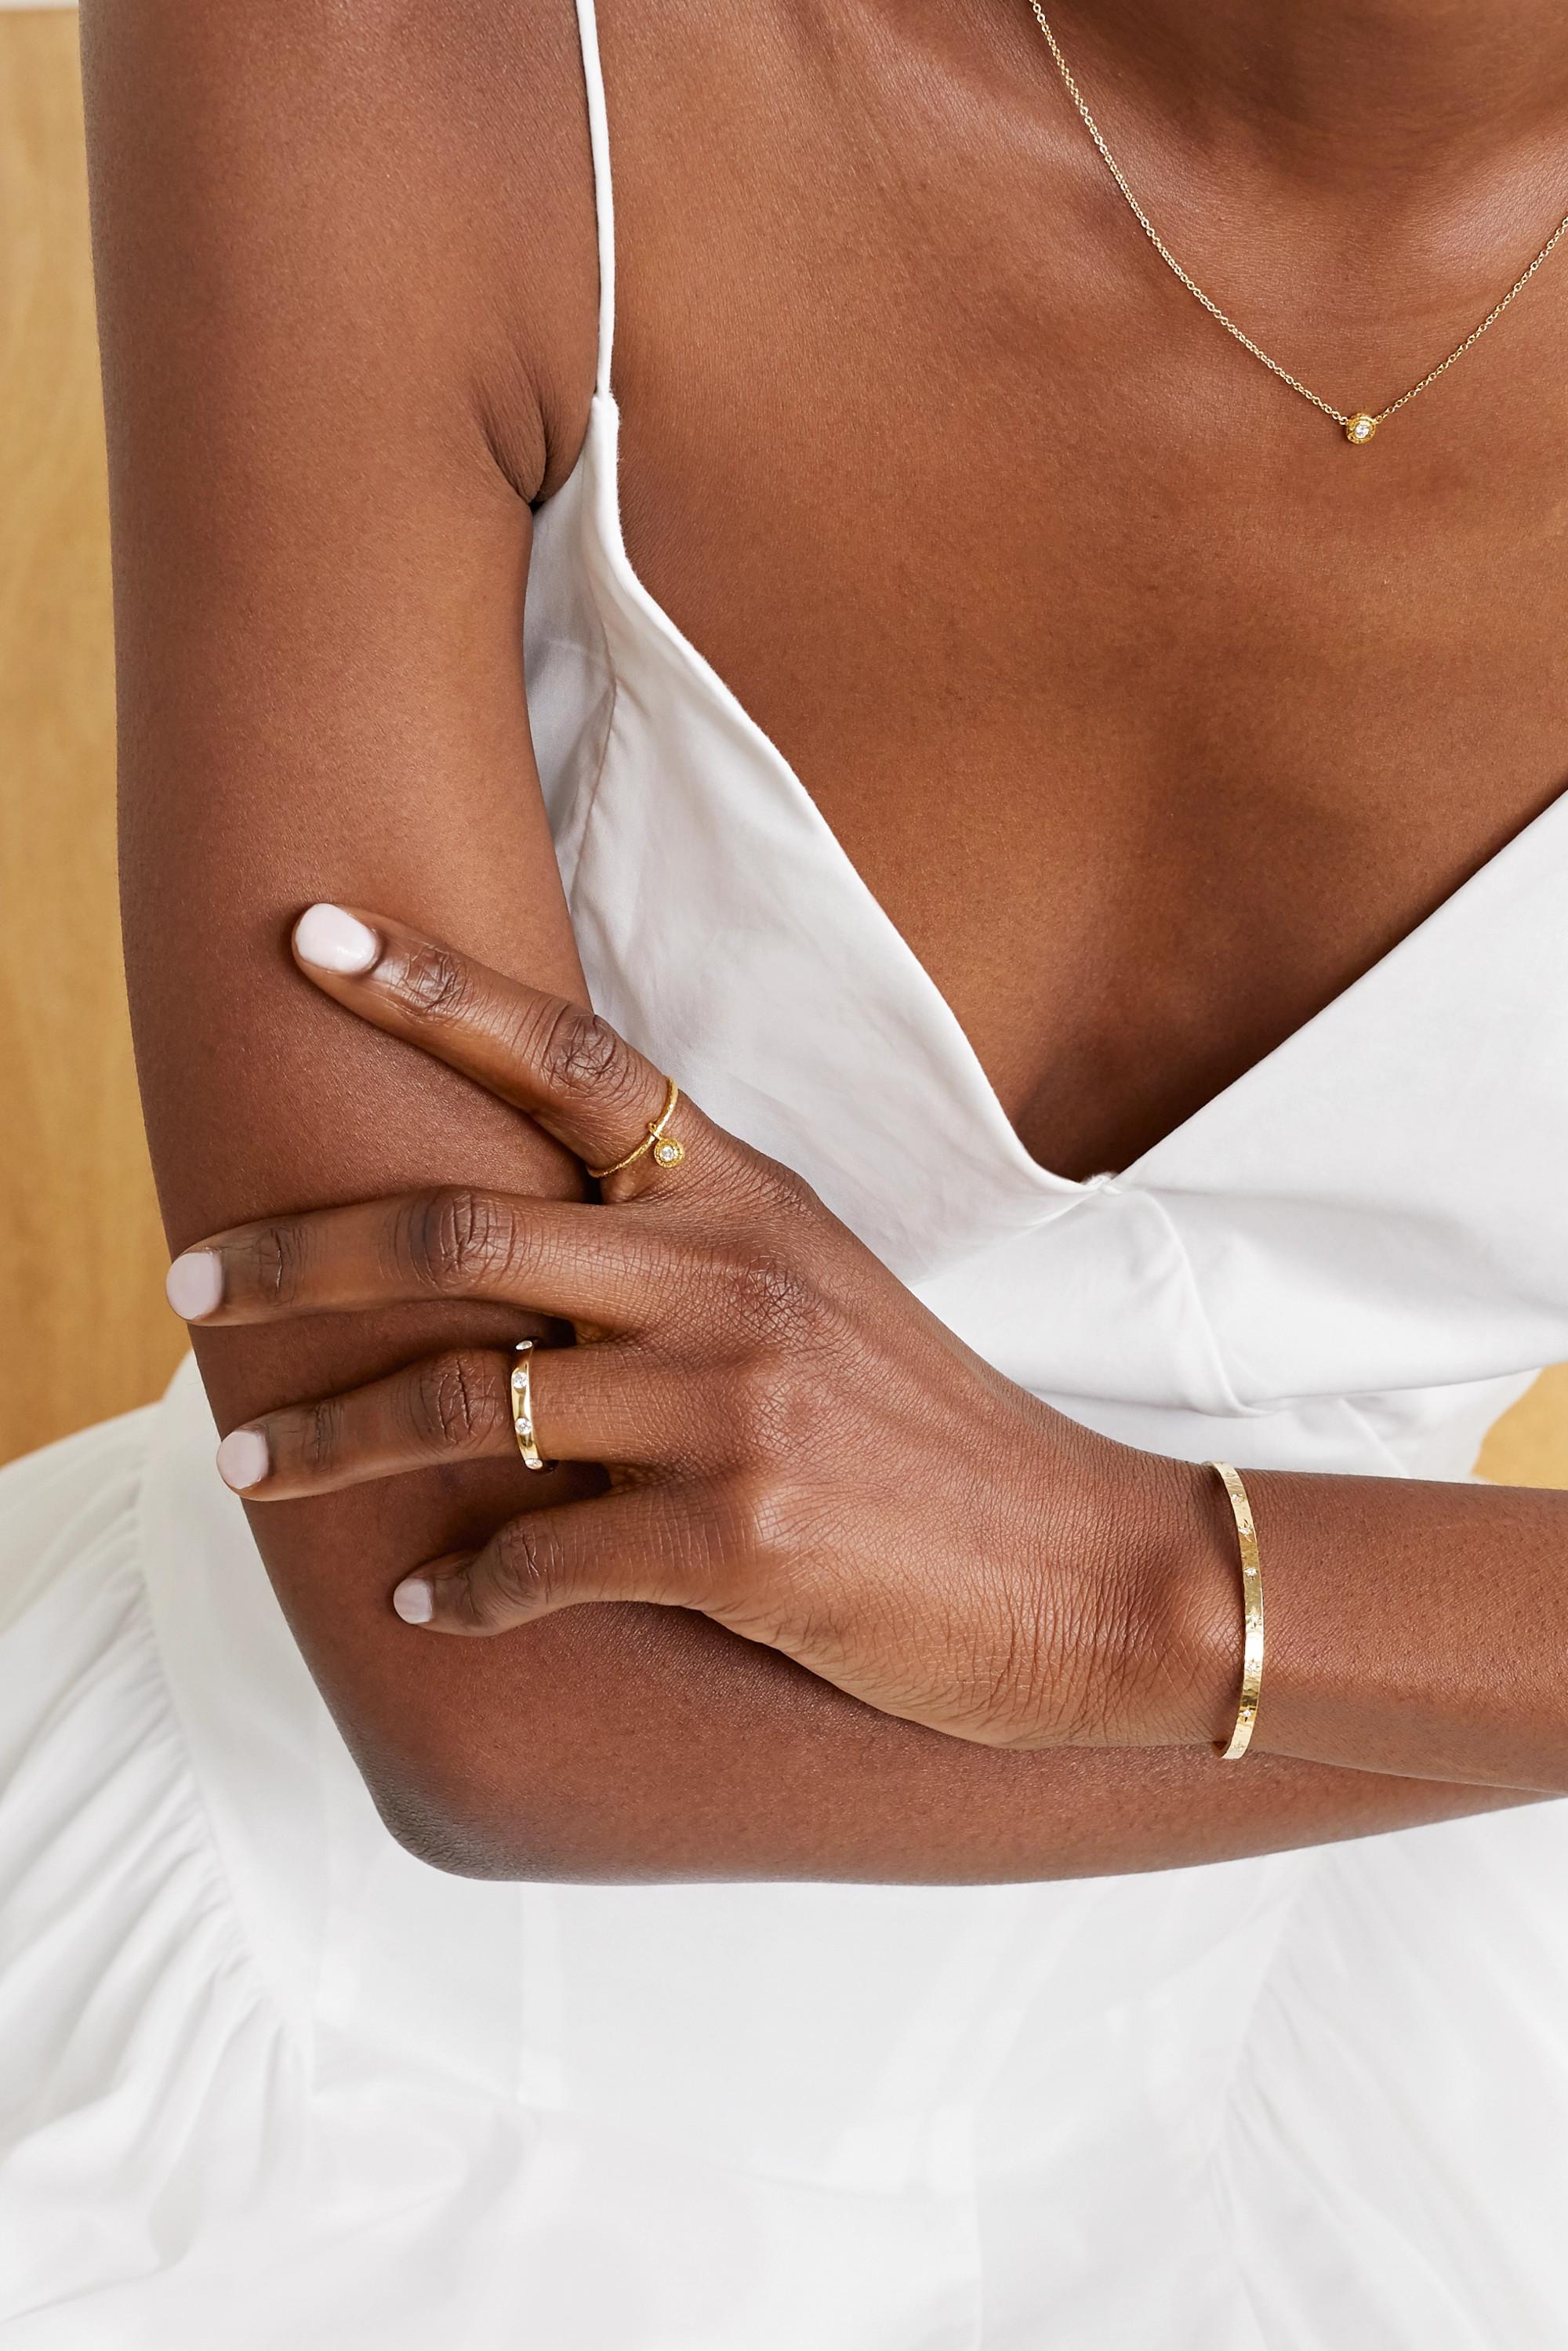 Octavia Elizabeth + NET SUSTAIN Nesting Gem 18-karat gold diamond ring